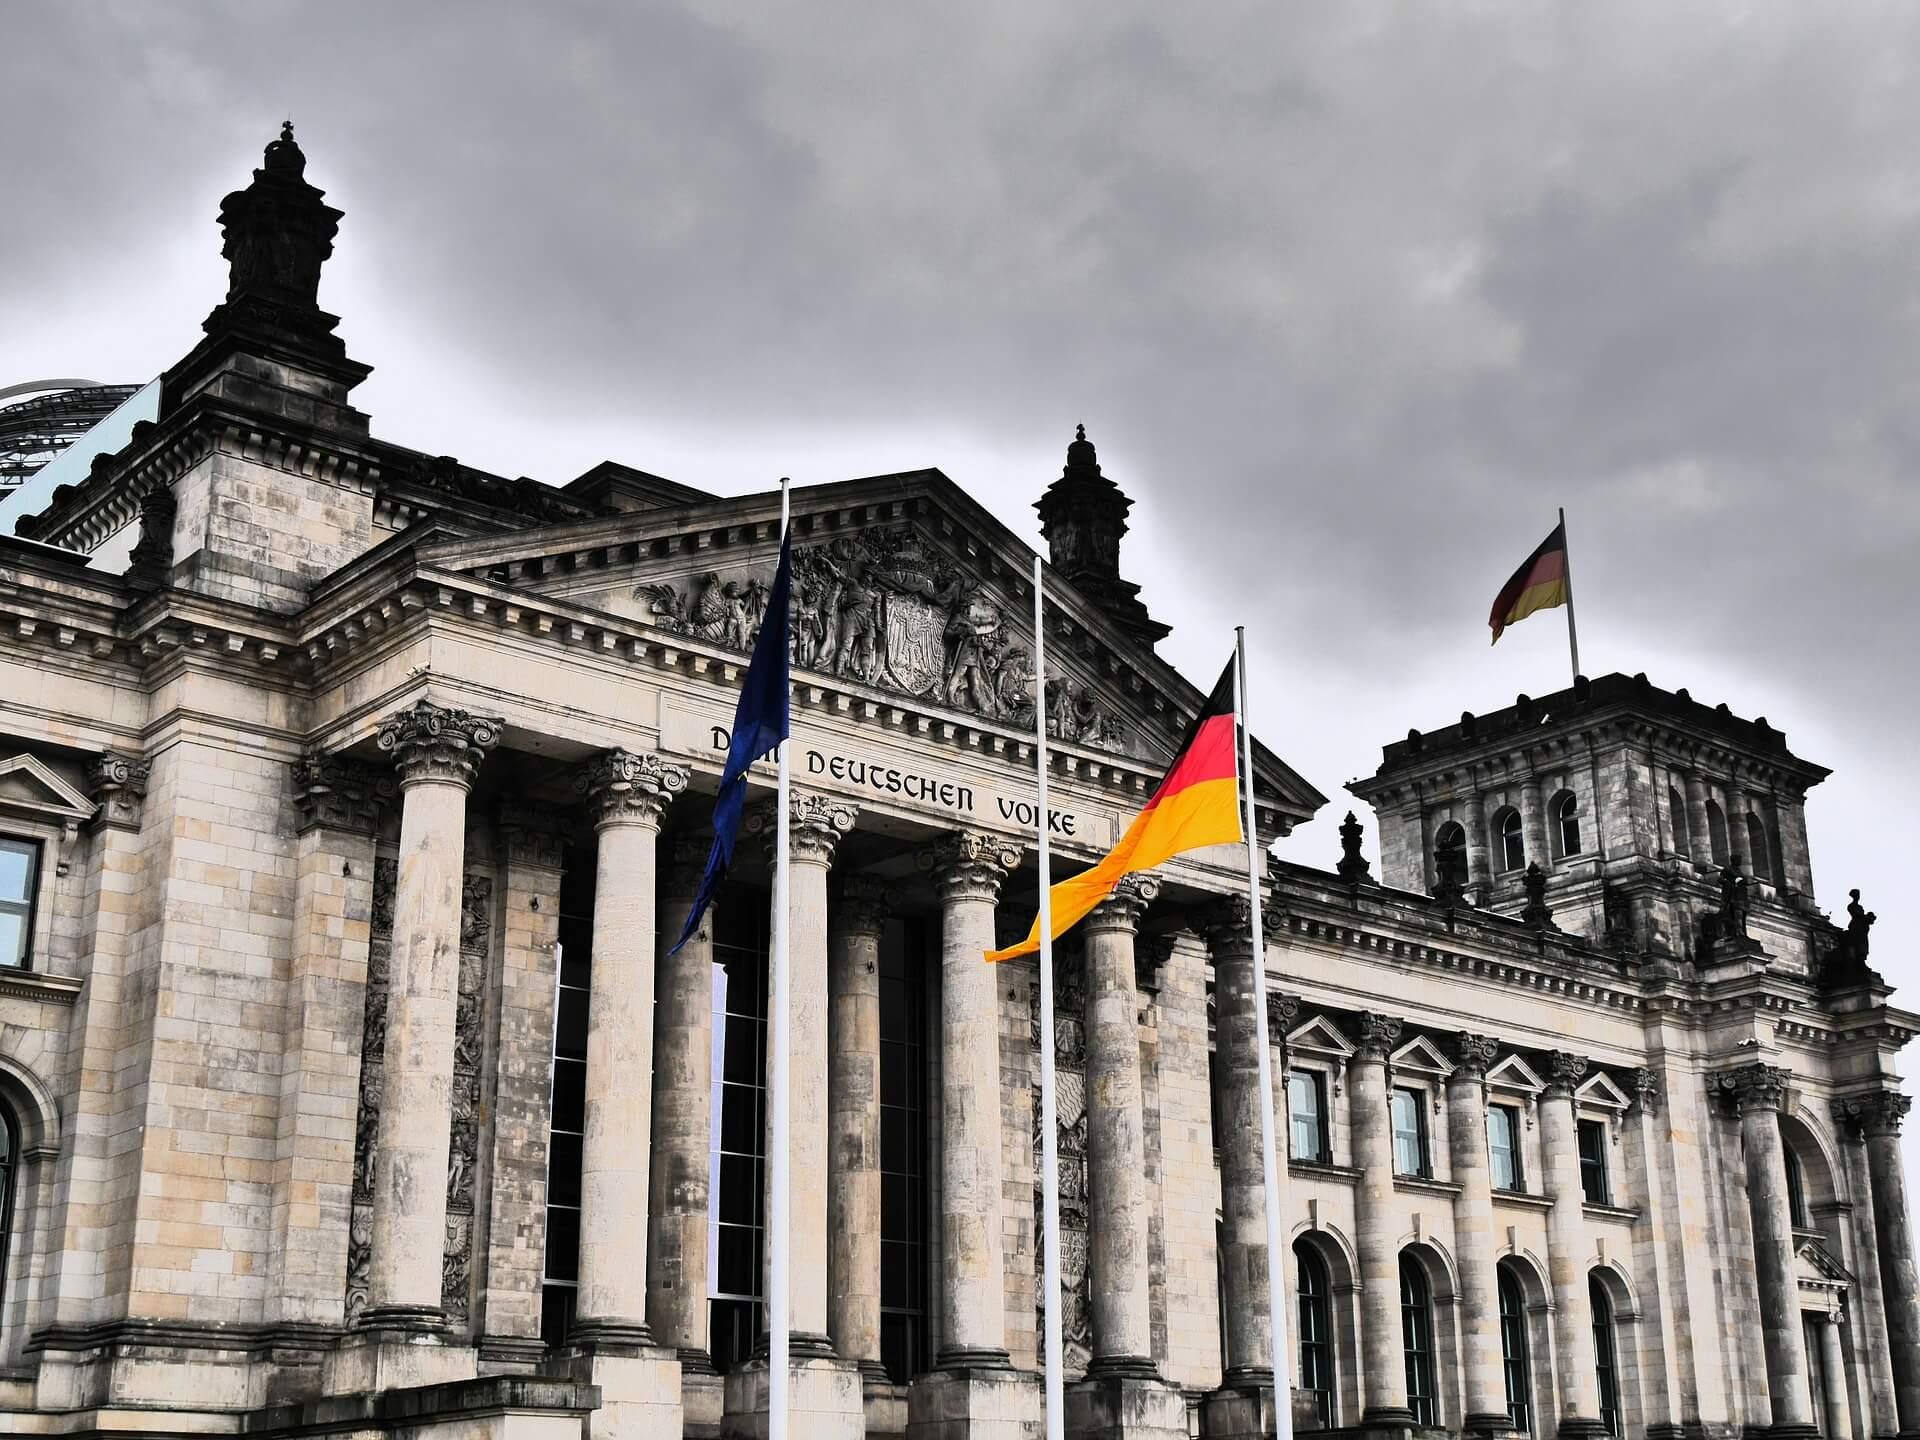 parlamento alemán. estudiar alemán en Medellín